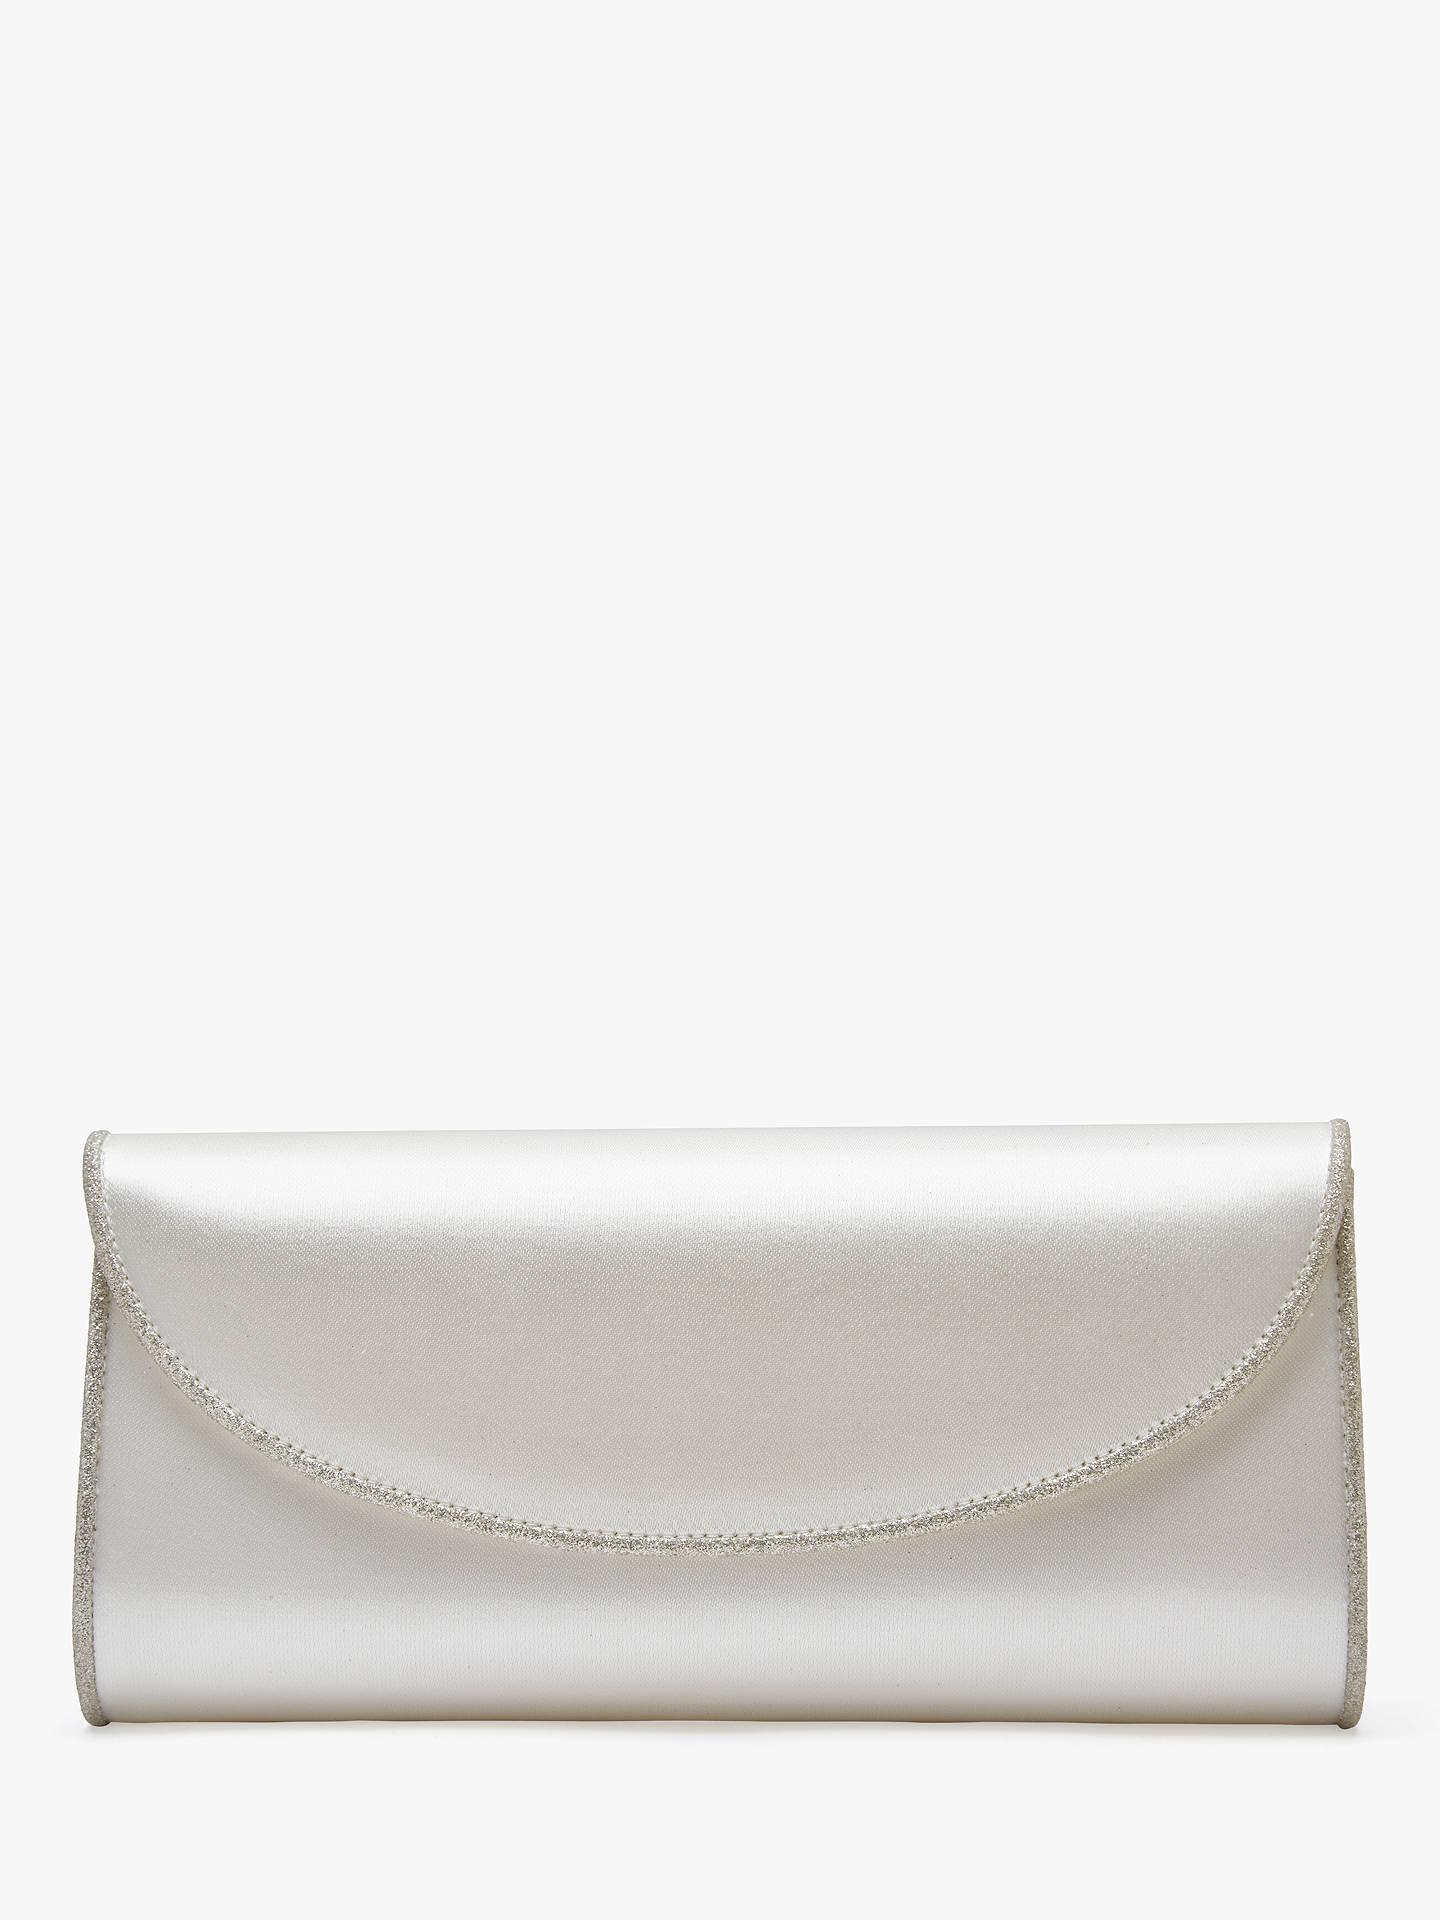 BuyRainbow Club Viki Clutch Bag, Ivory Online at johnlewis.com 47571fc303